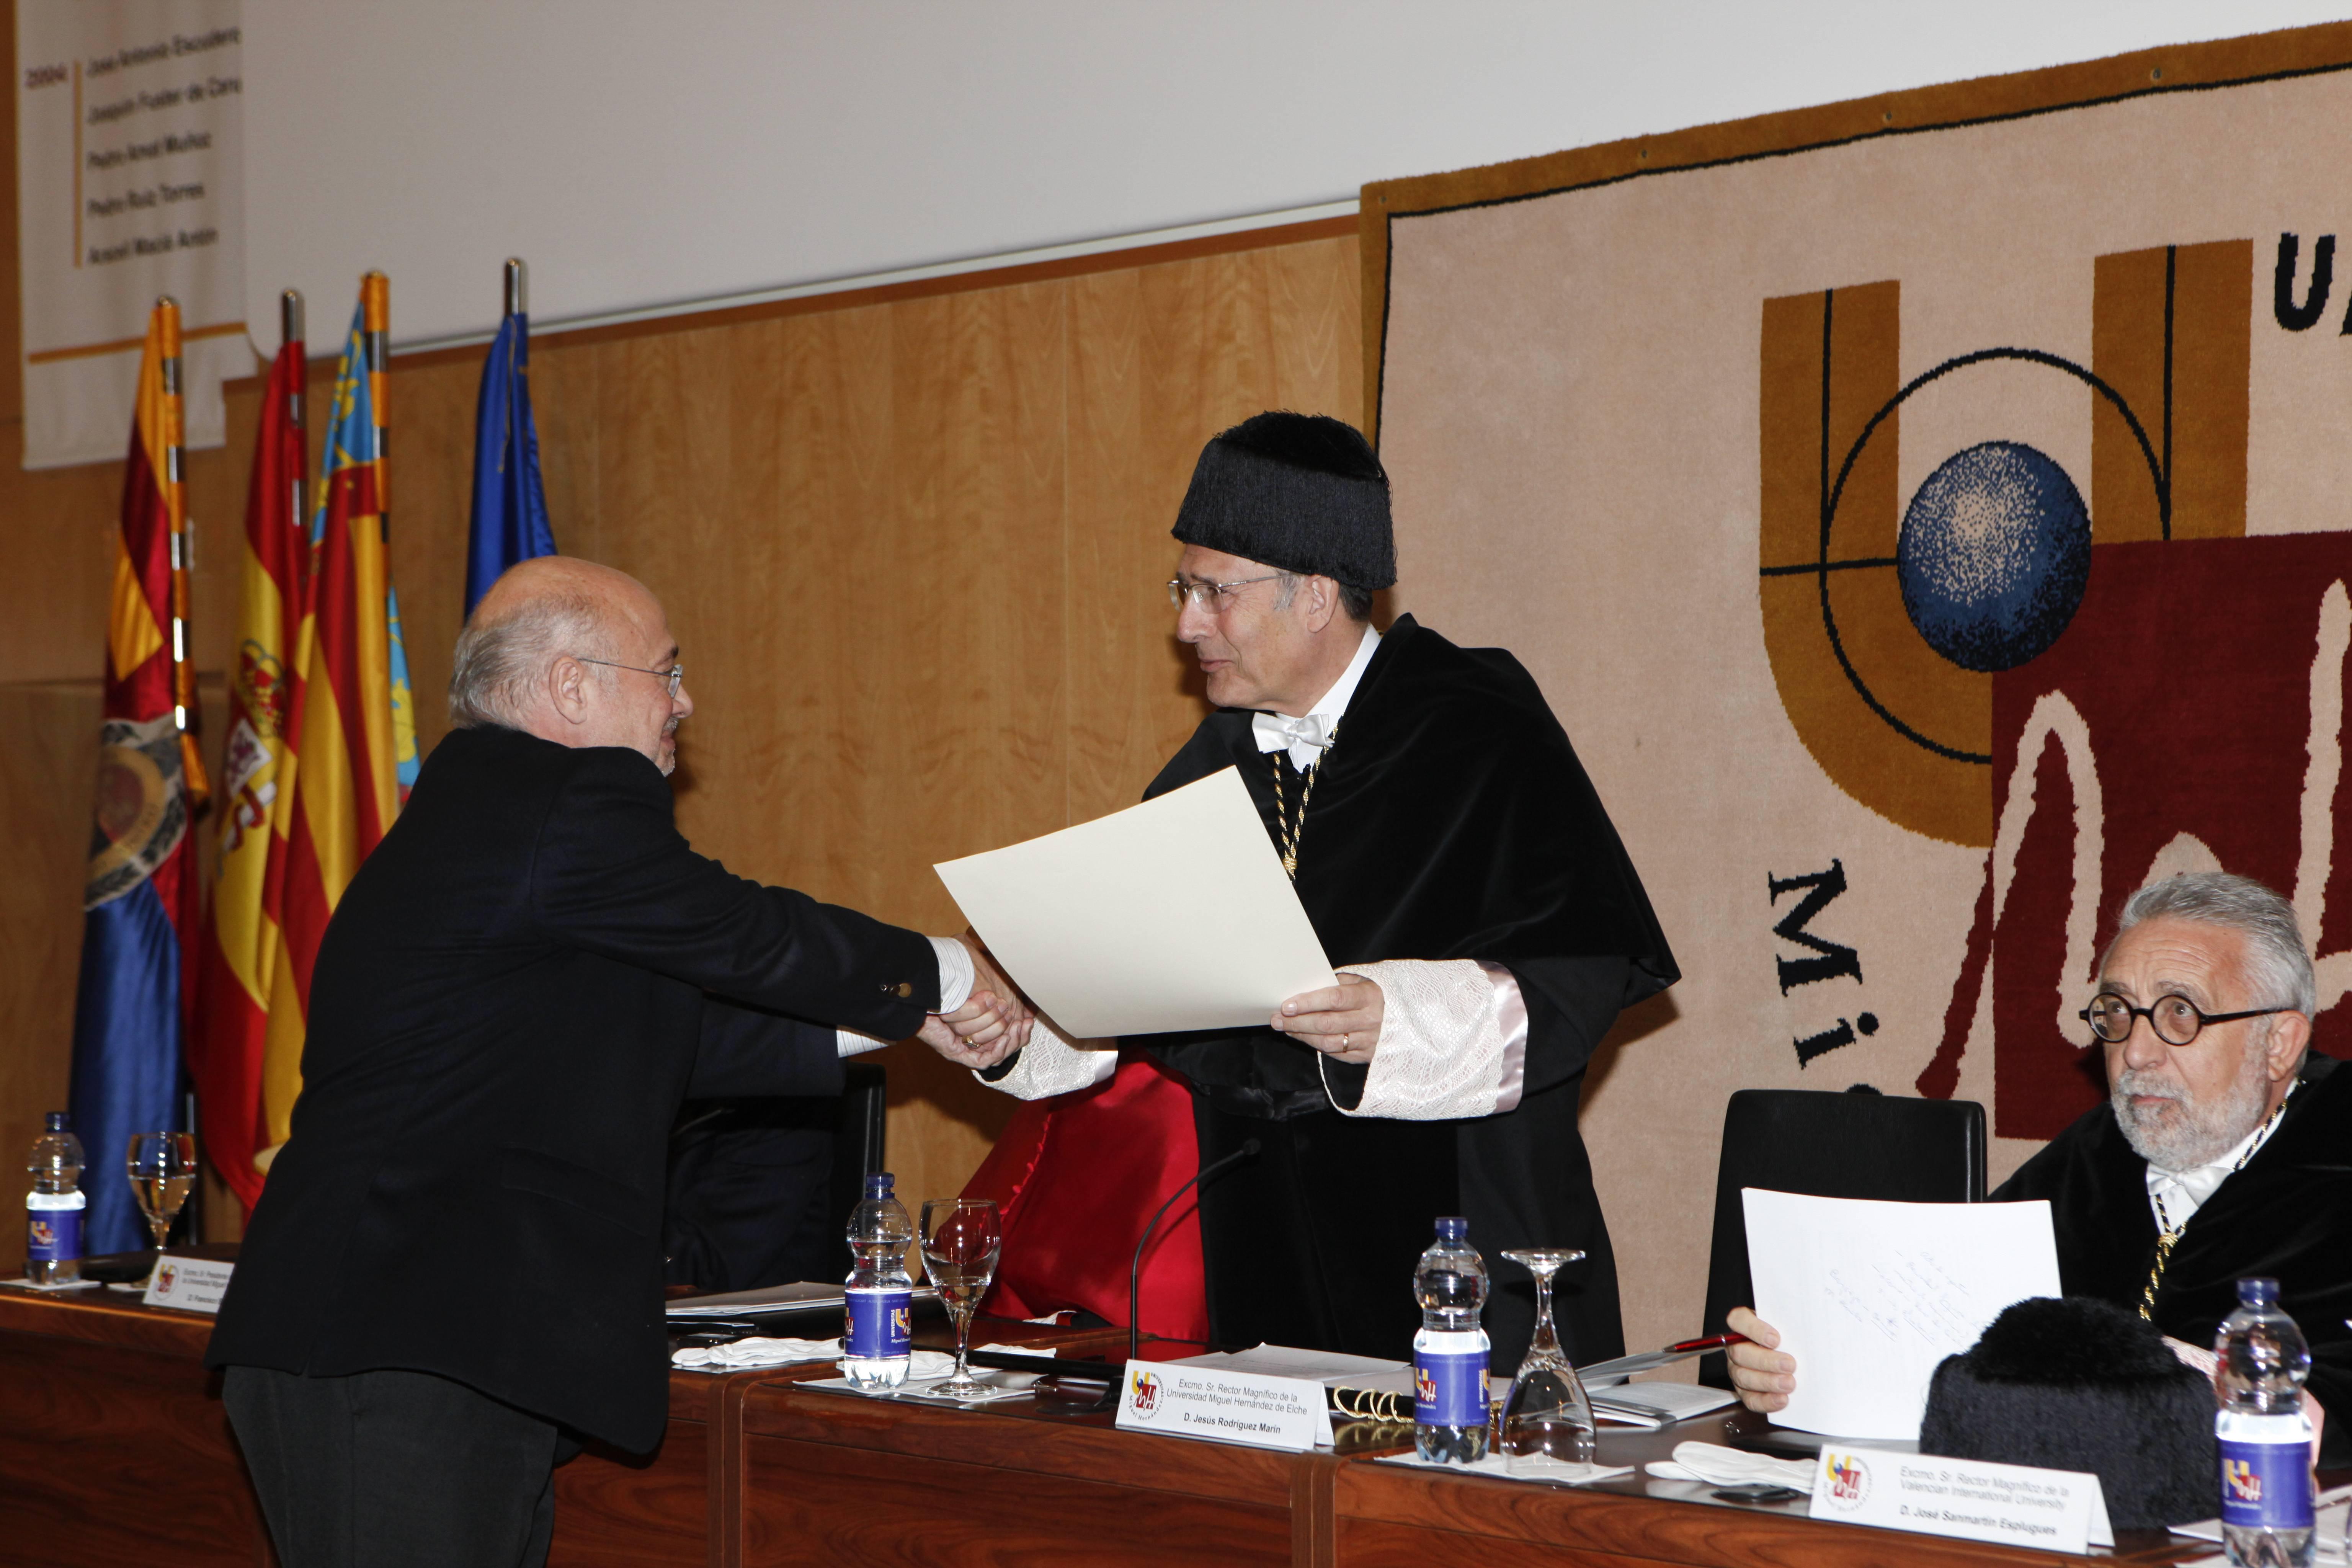 doctor-honoris-causa-luis-gamir_mg_1063.jpg